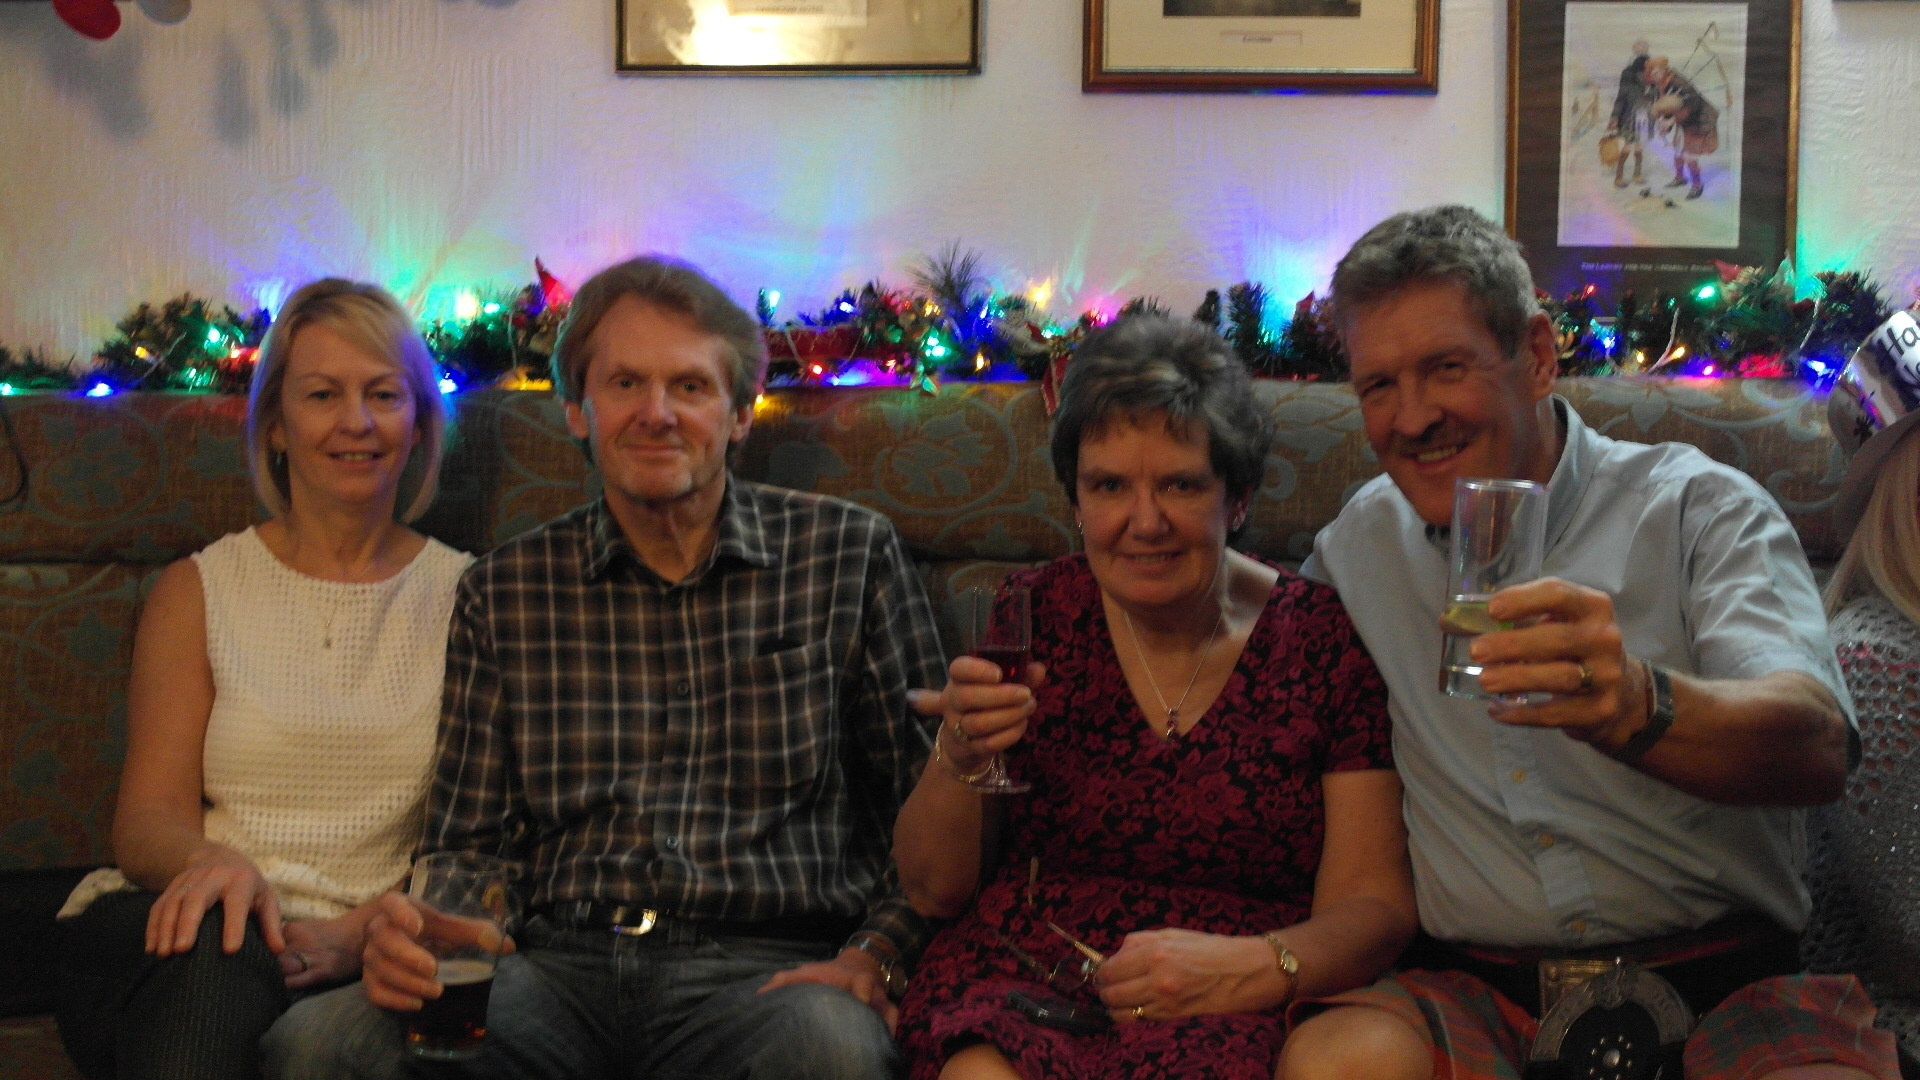 The group celebrate Hogmanay (Chris Austin / DC Thomson)